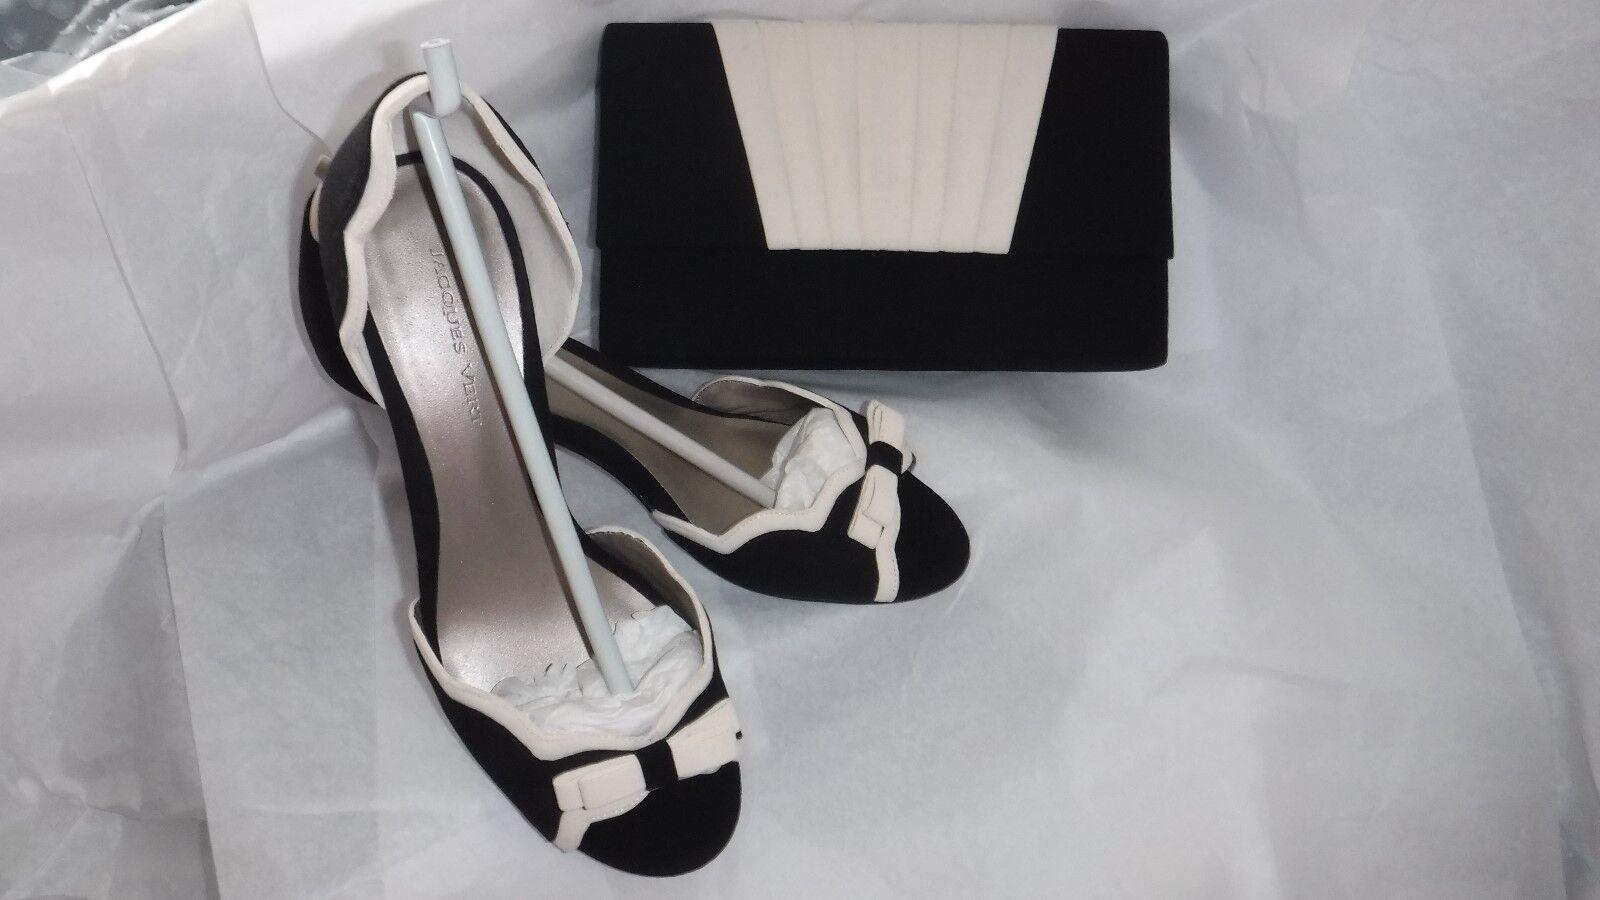 PRETTY JACQUES VERT BLACK & CREAM 38. Schuhe EU 38. CREAM UK 5  & MATCHING BAG 625e36